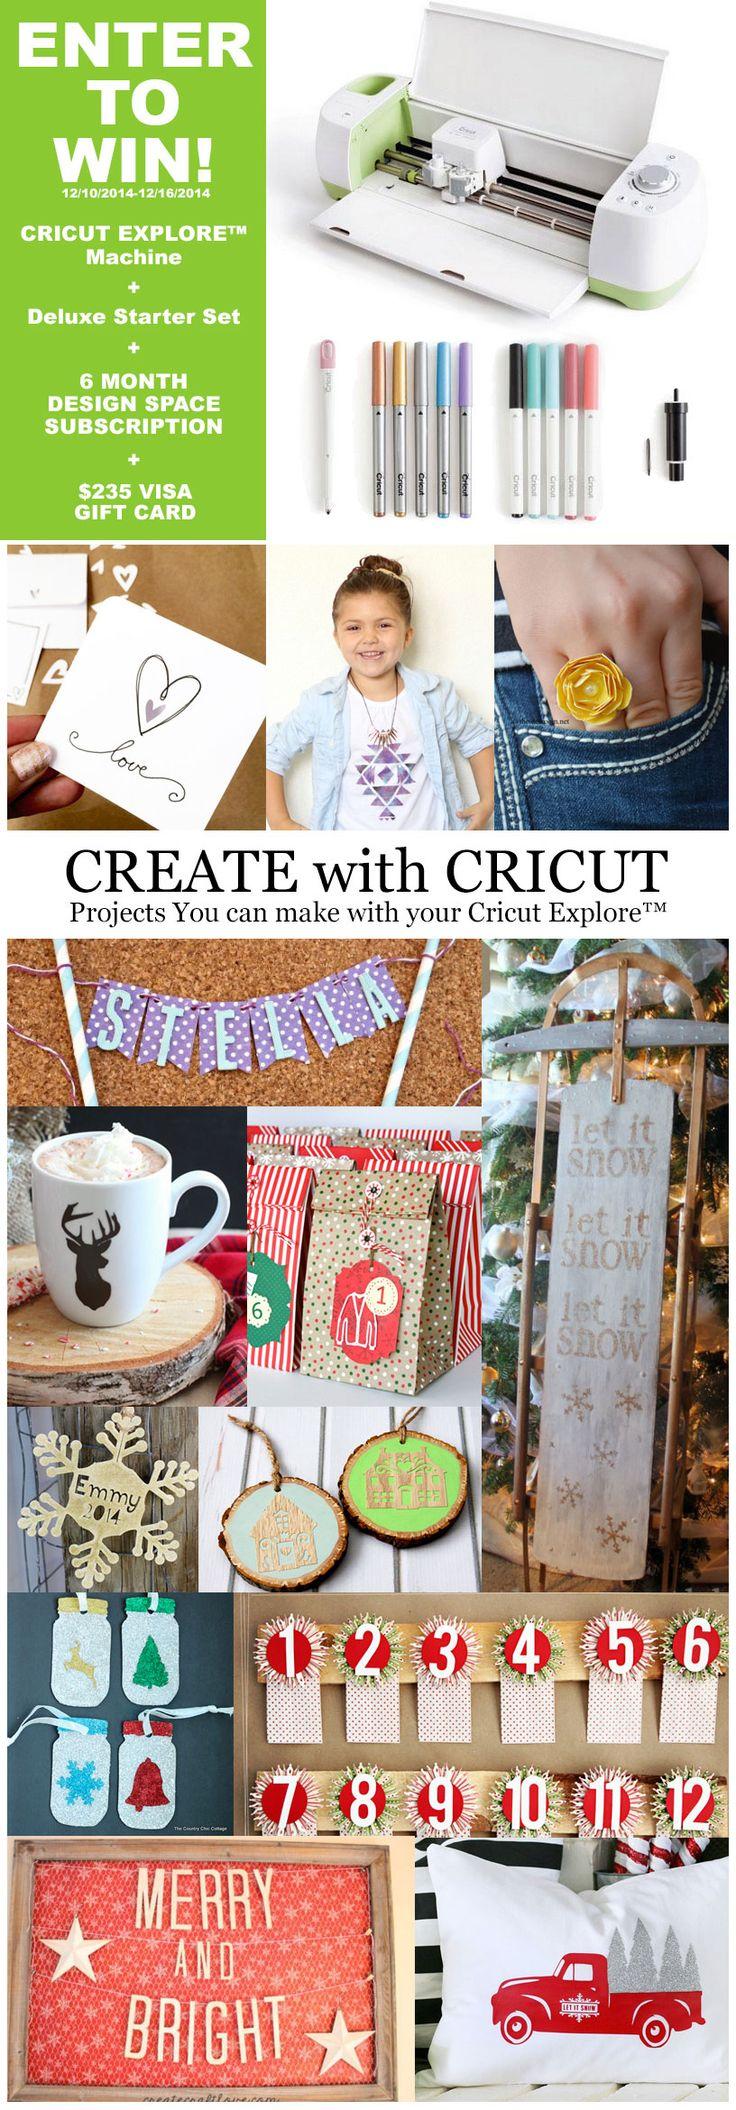 Big Cricut Bundle Giveaway